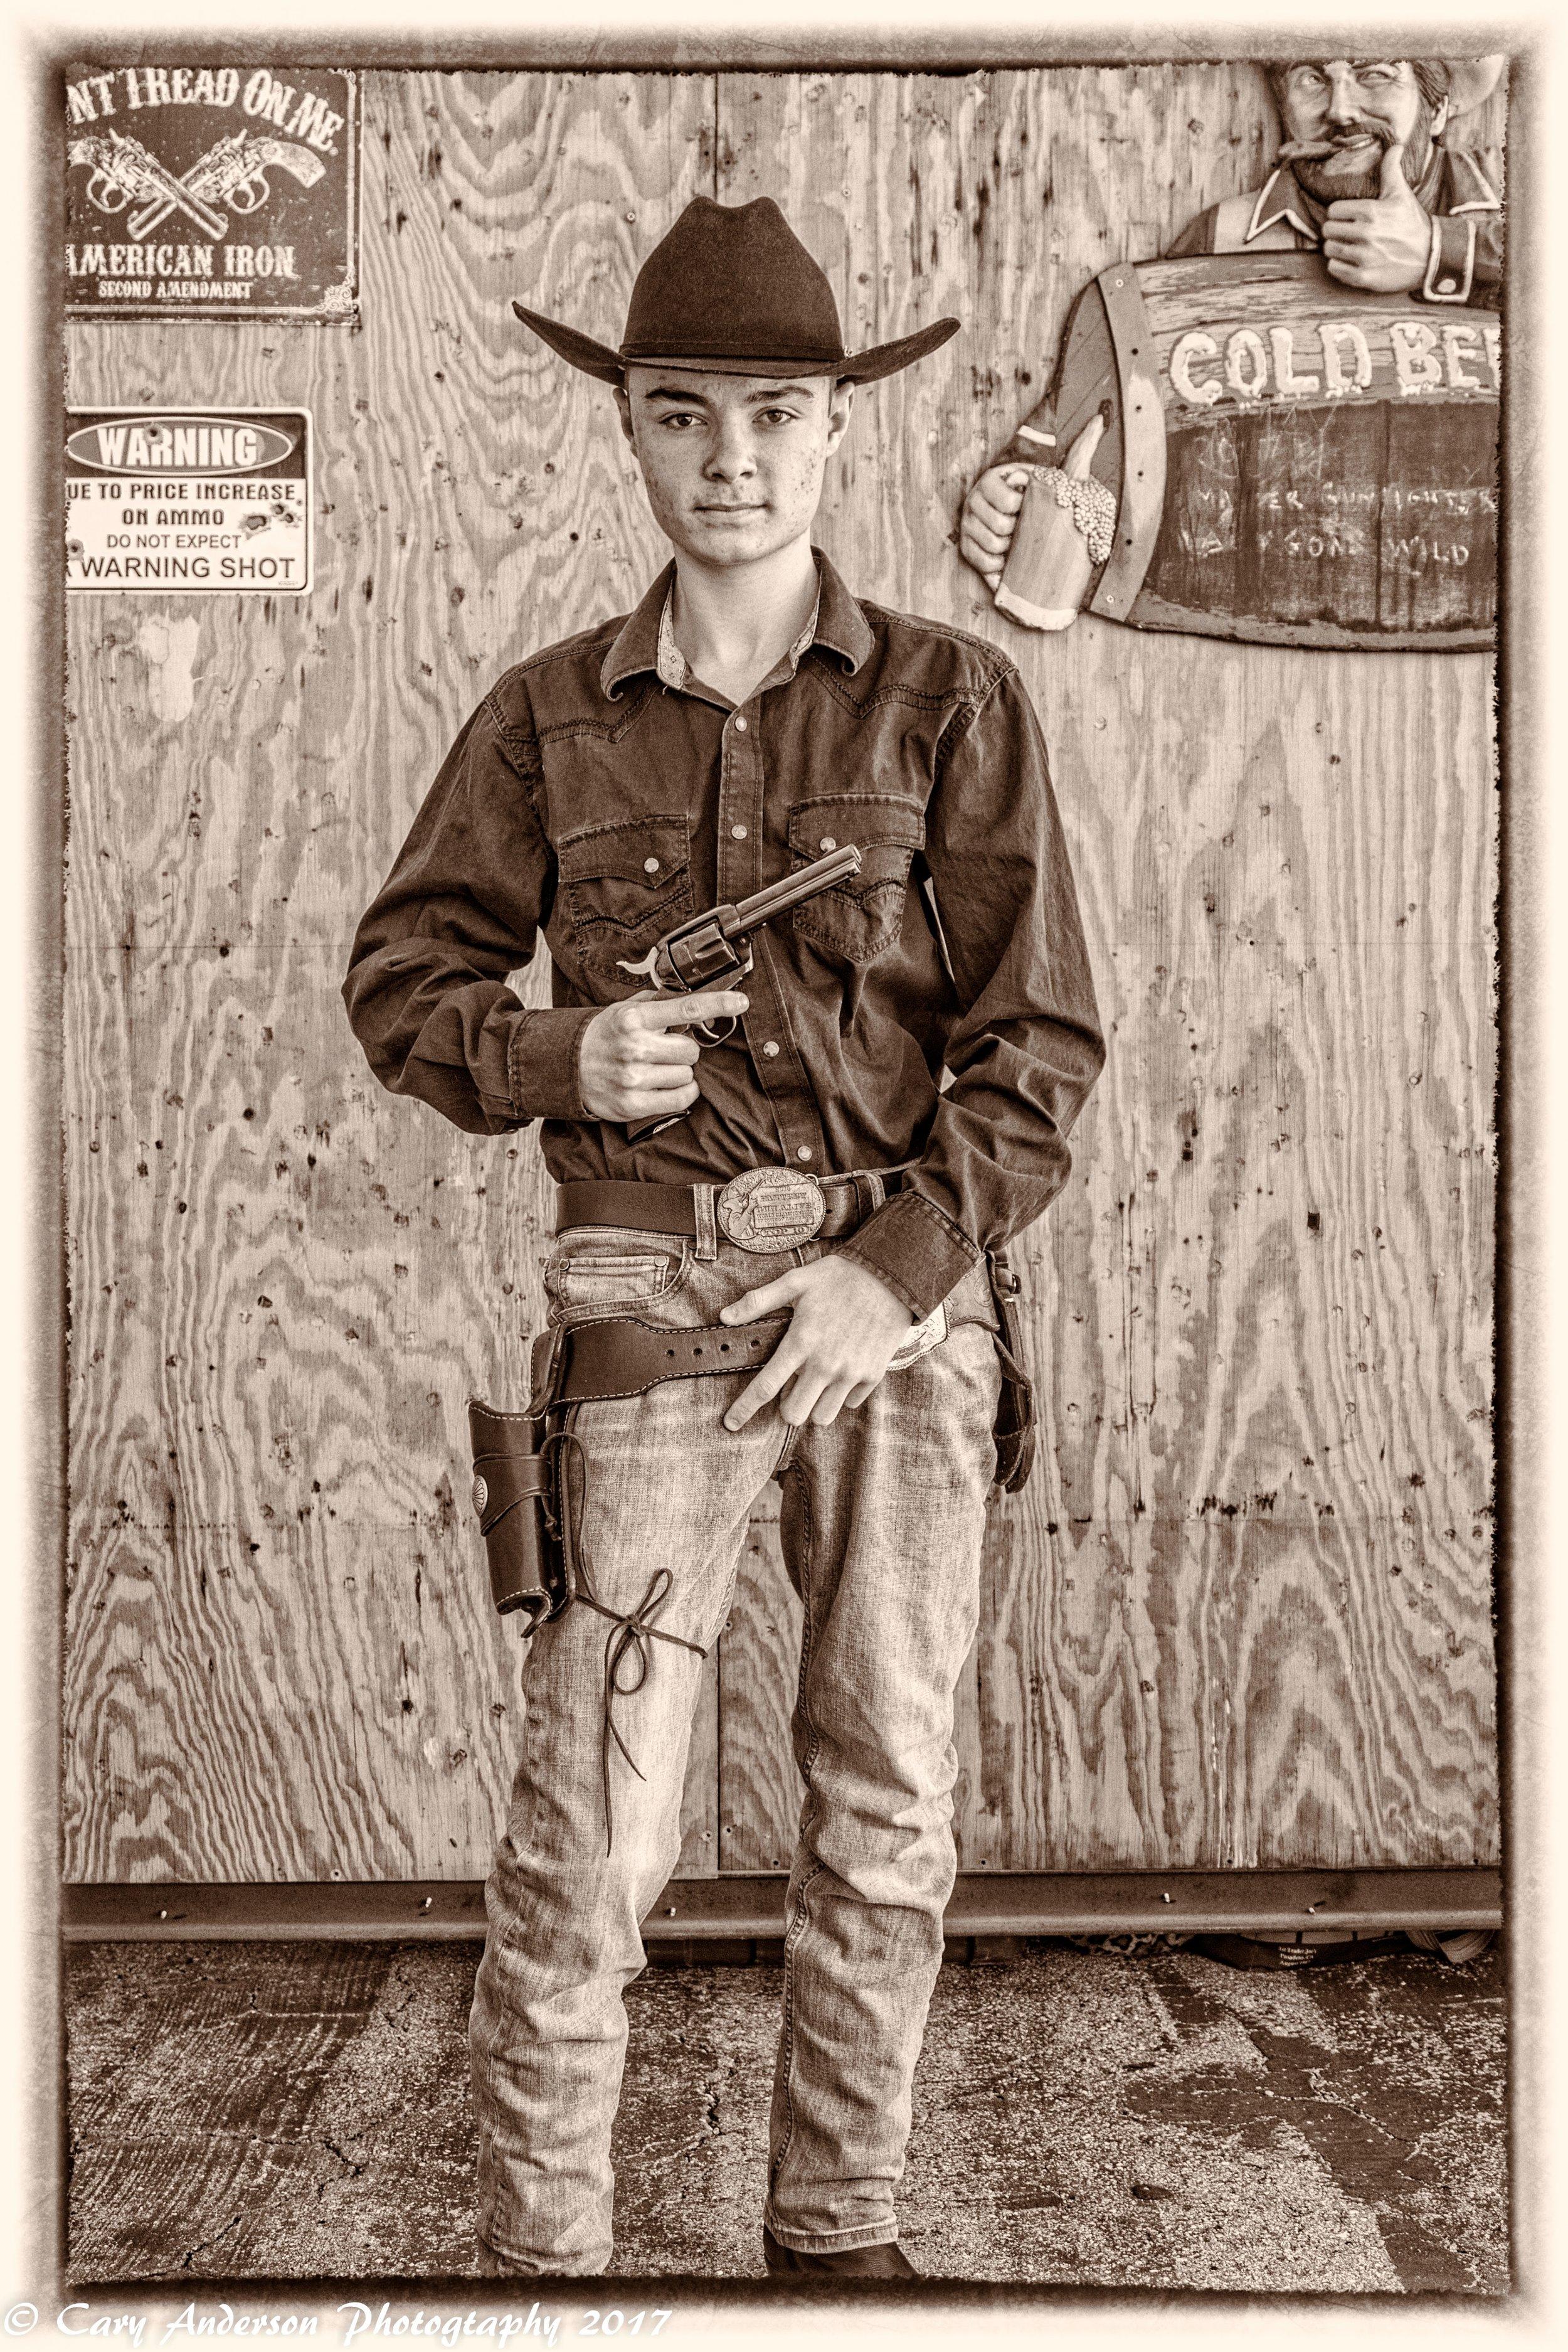 Johnny deputy